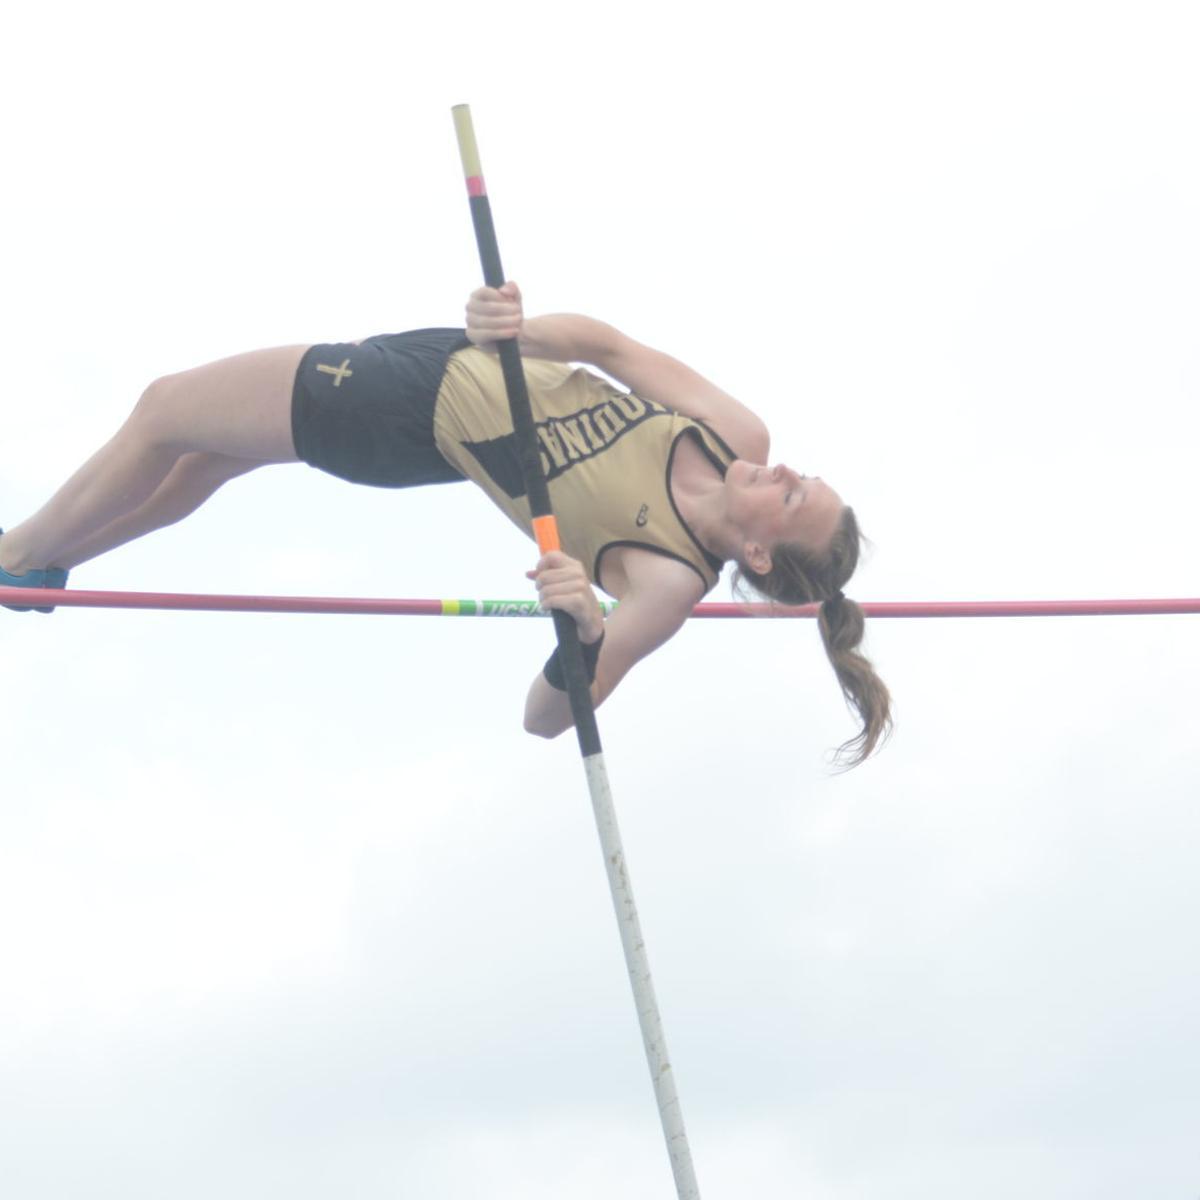 Oborny's runner-up pole vault highlights Friday at state